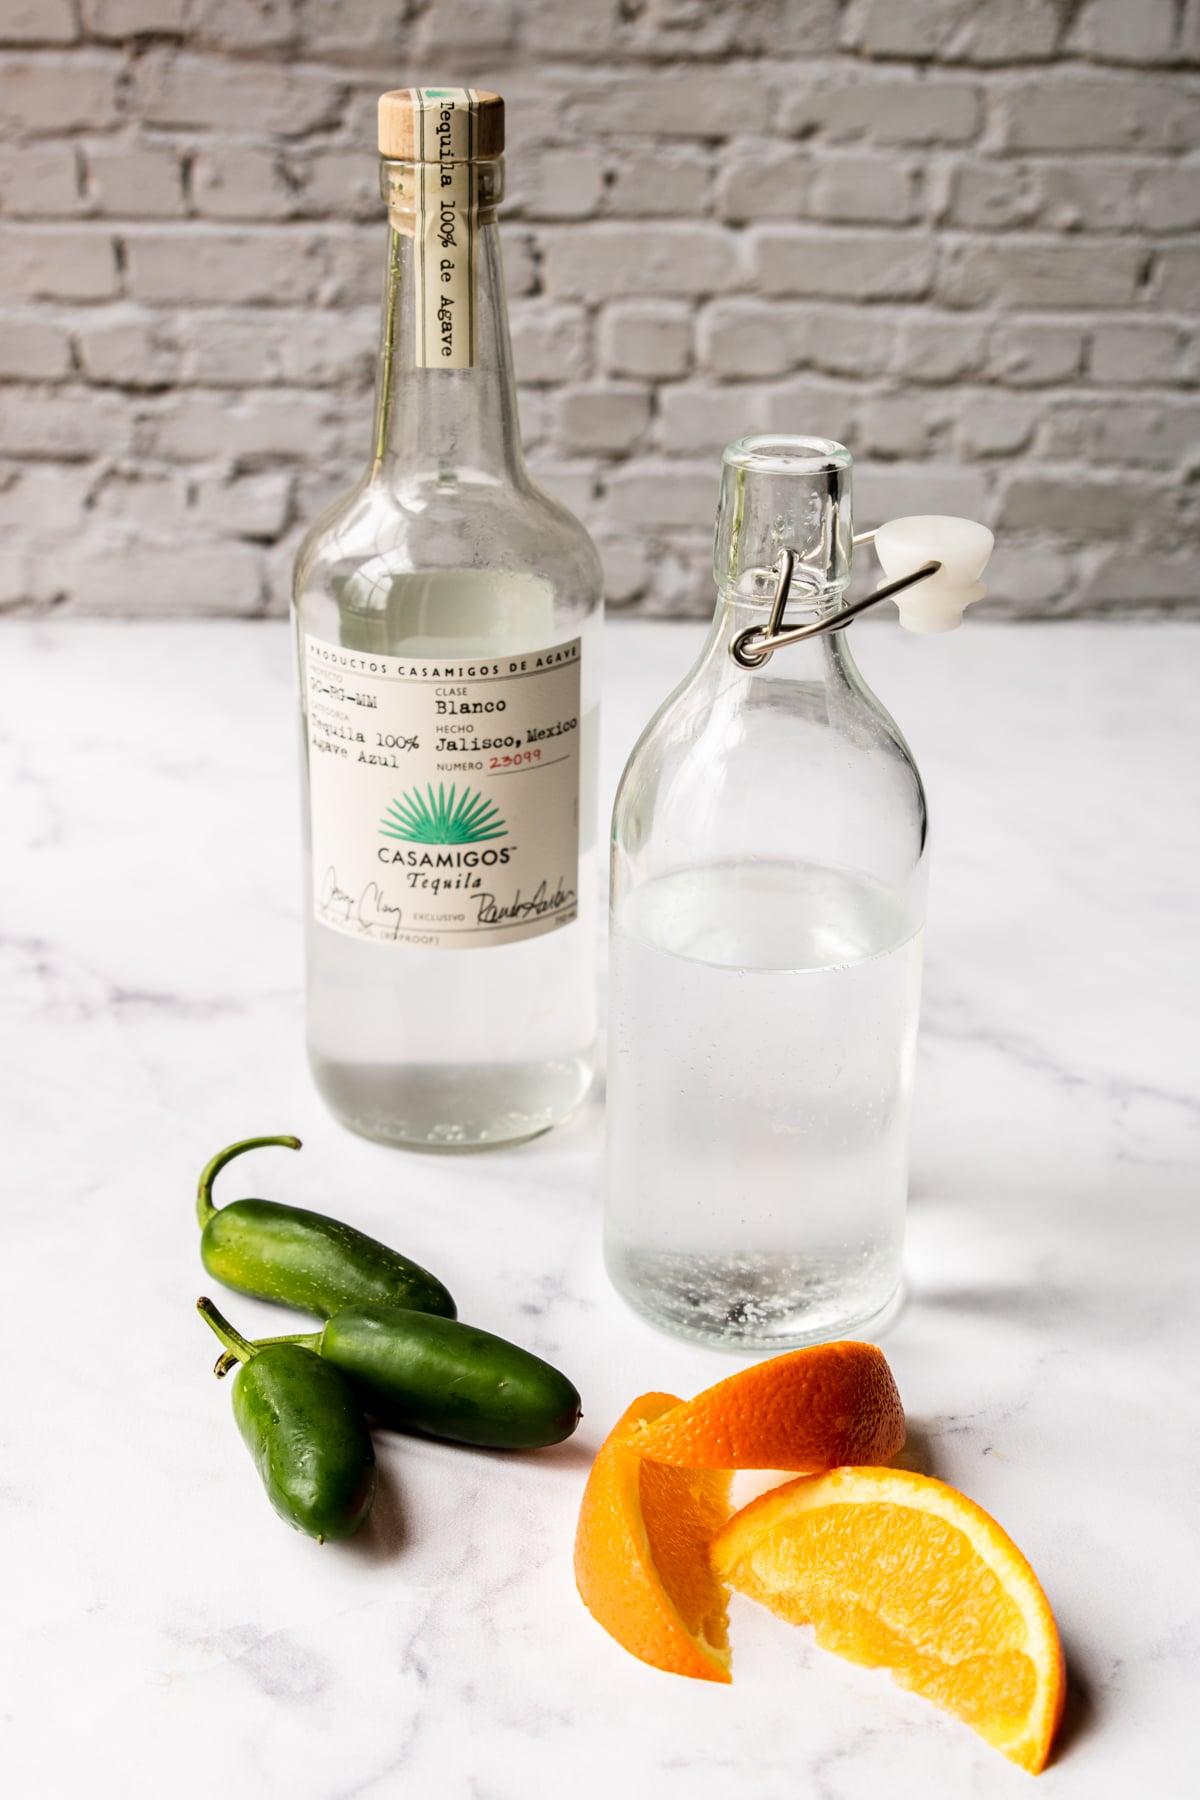 tequila, soda water, orange, and jalapeno